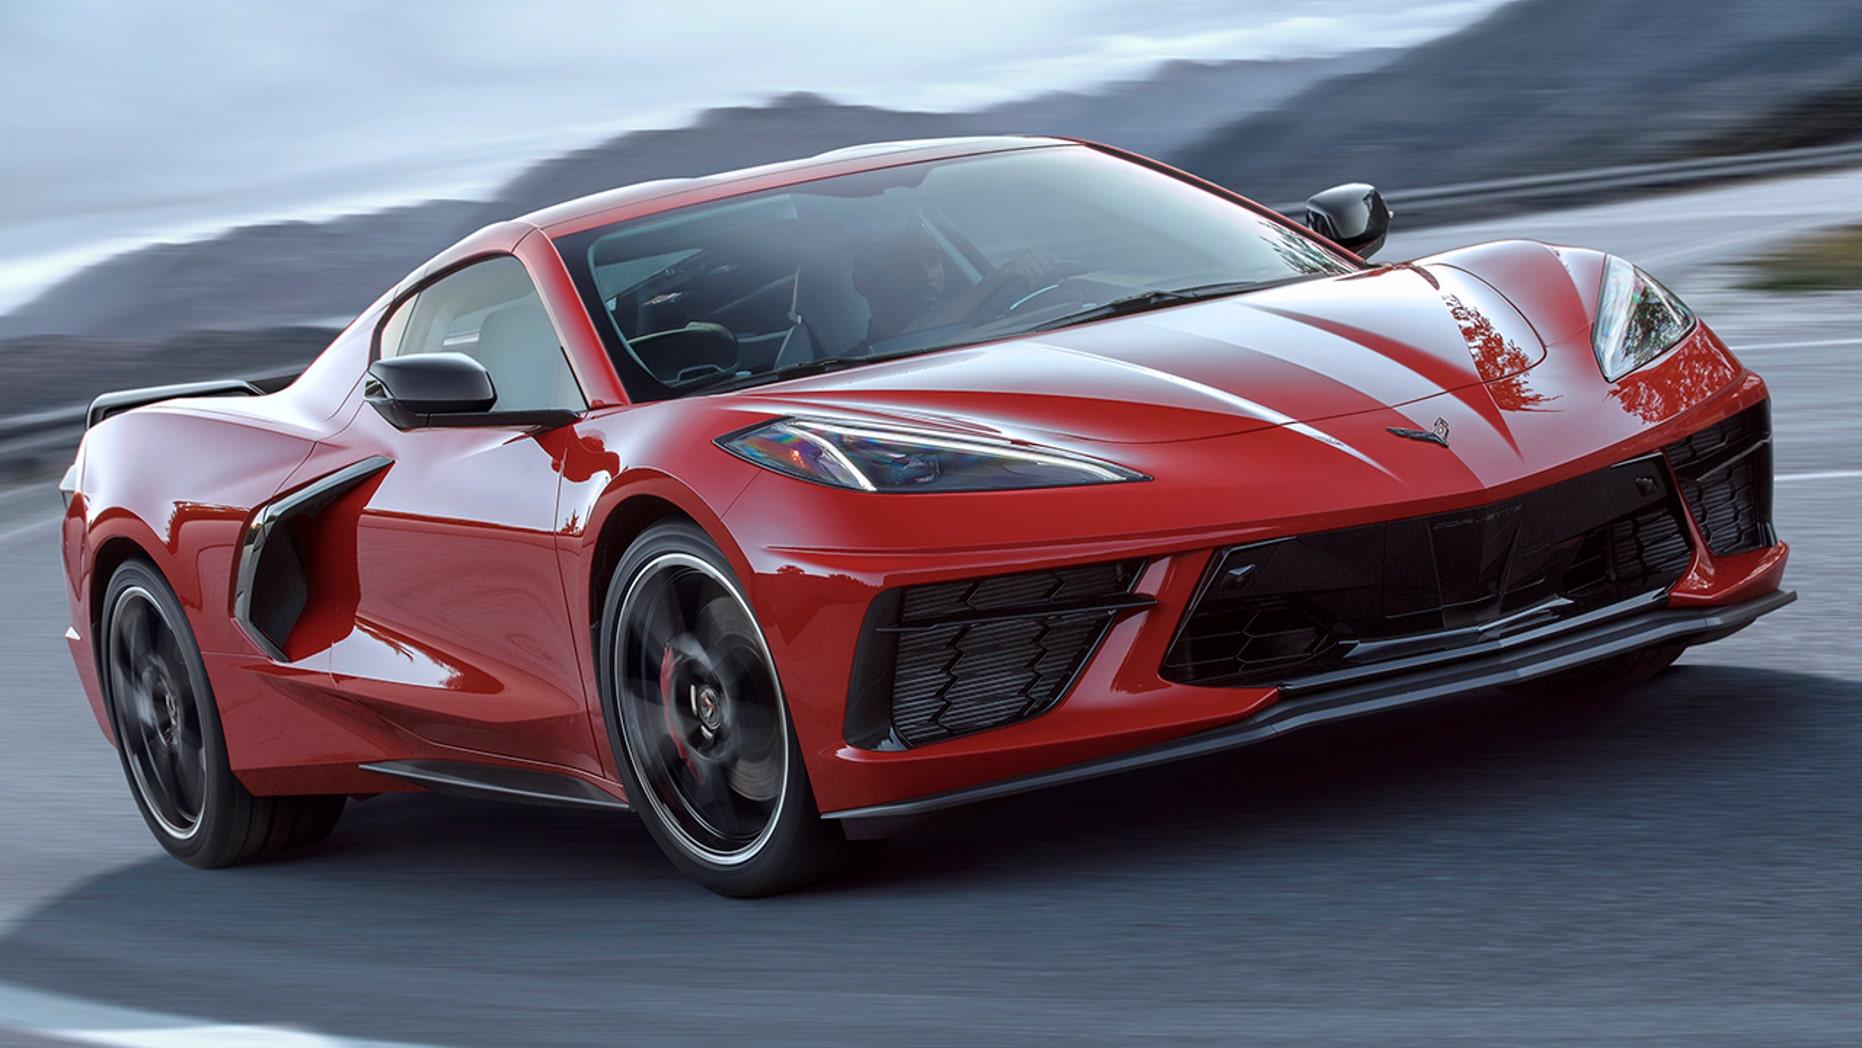 The 2020 Chevrolet Corvette Stingray Price Revealed The